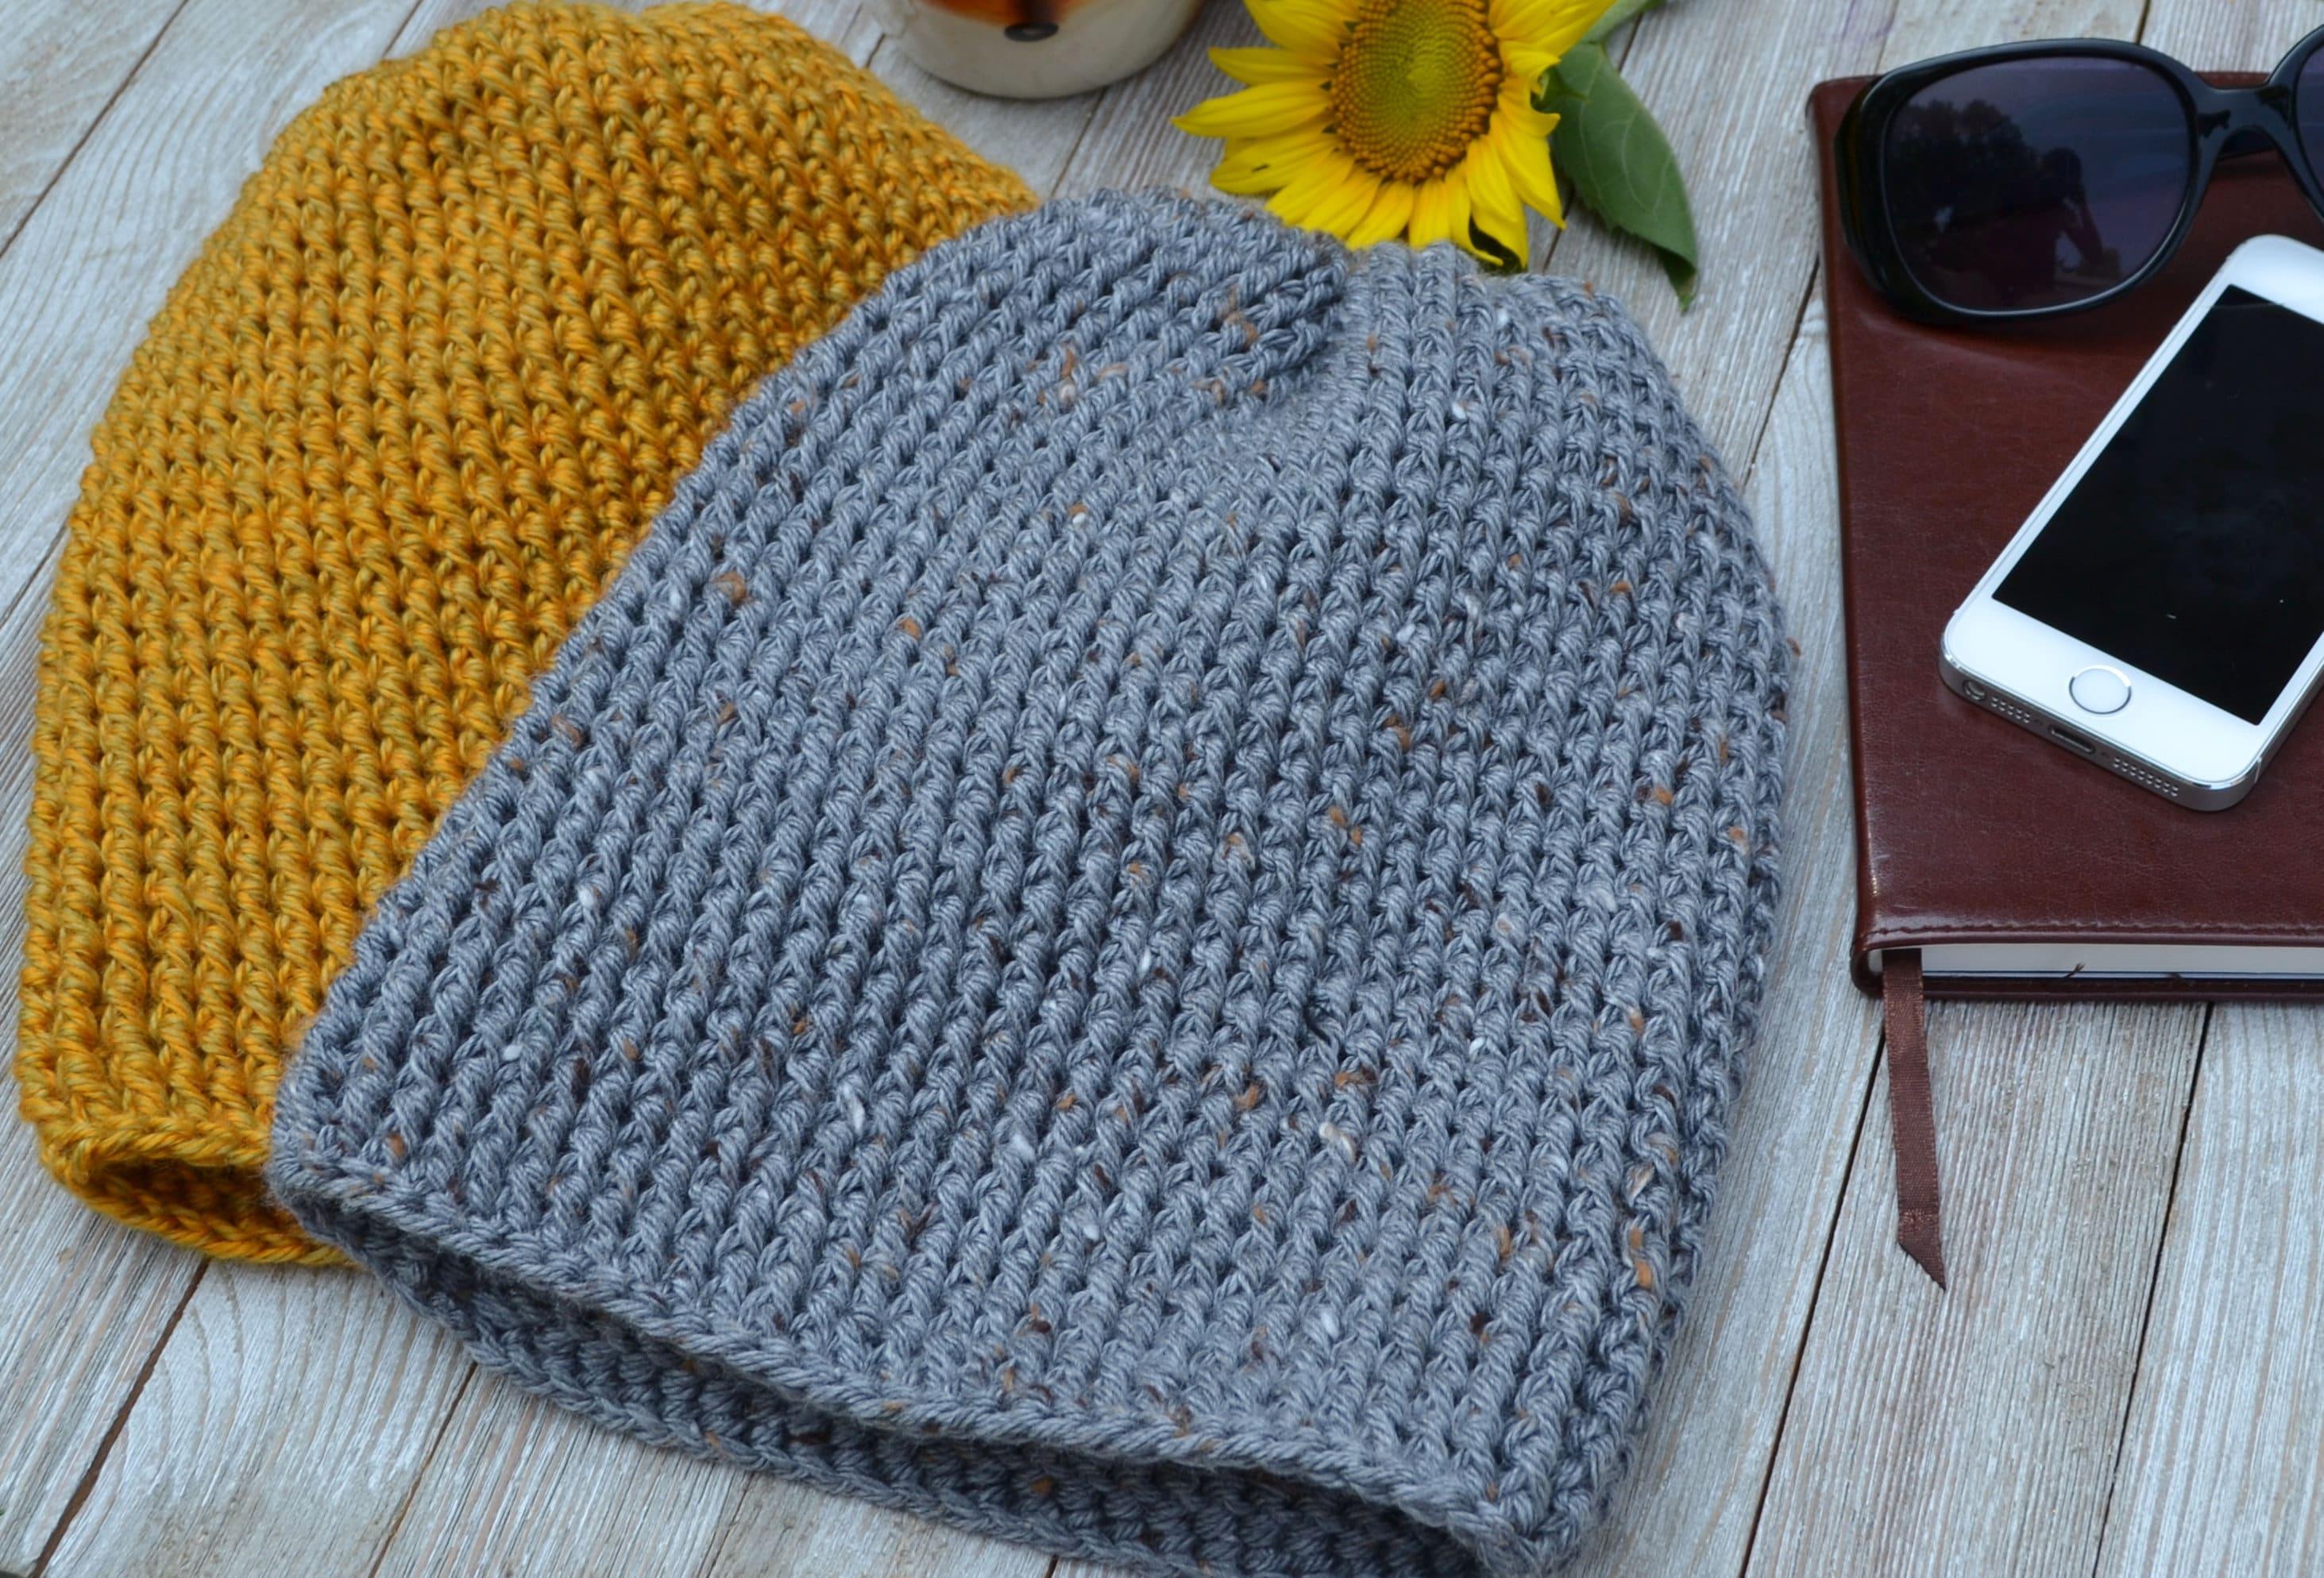 Crochet Pattern The Harvest Beanie Pdf File Crochet Beanie Etsy